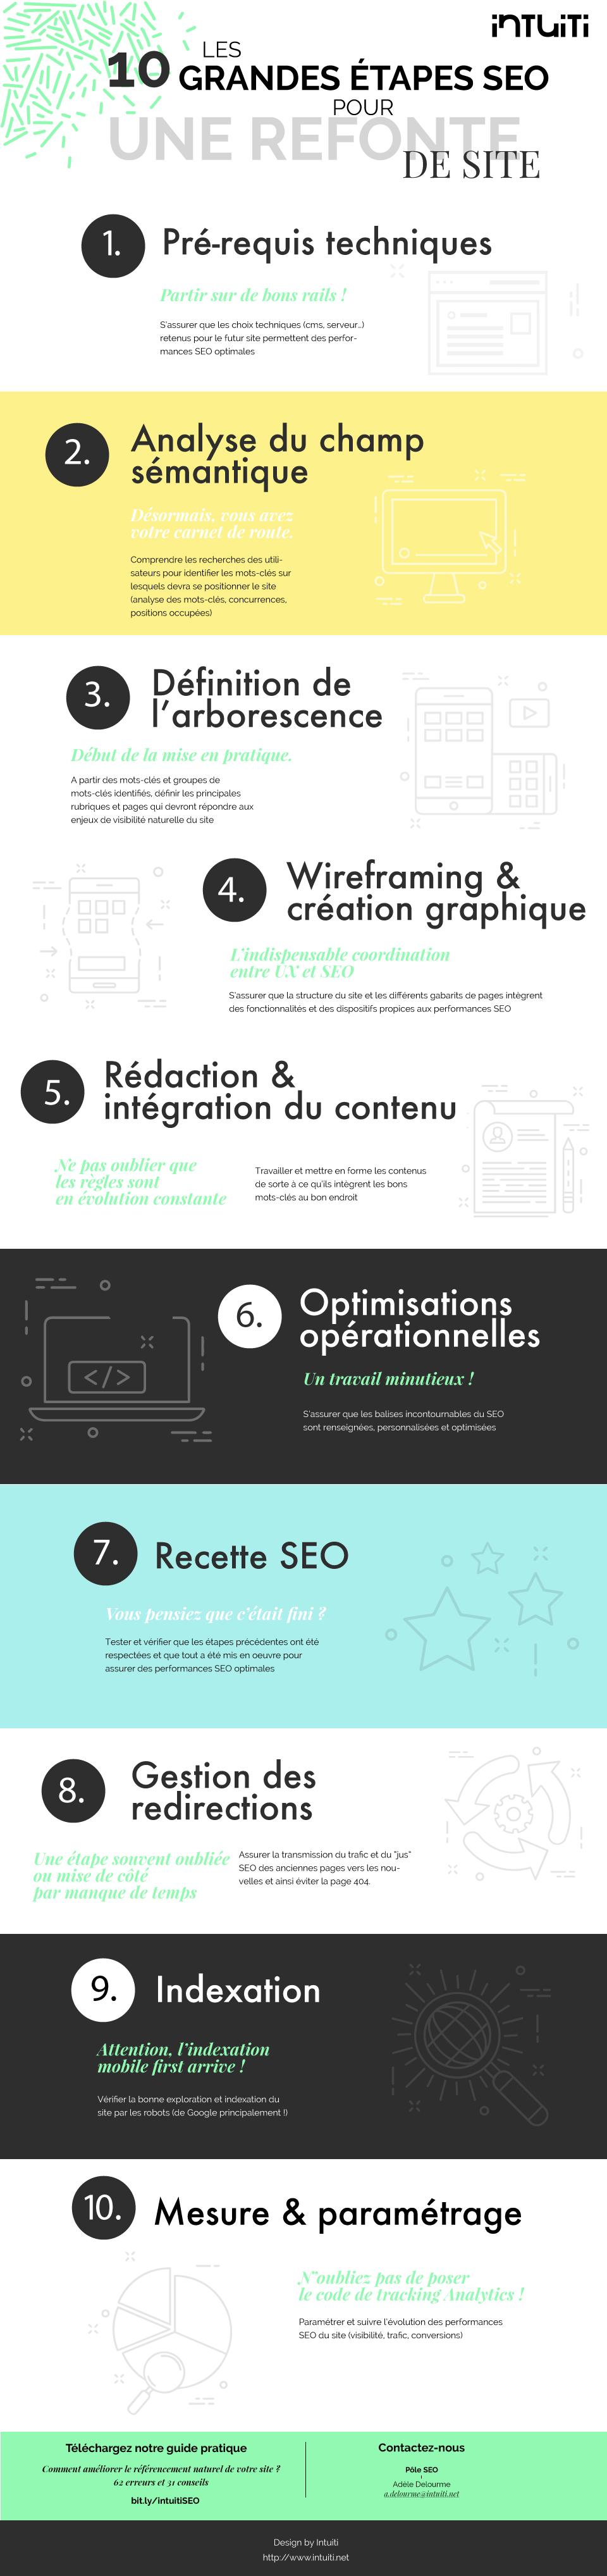 10 étapes SEO refonte web